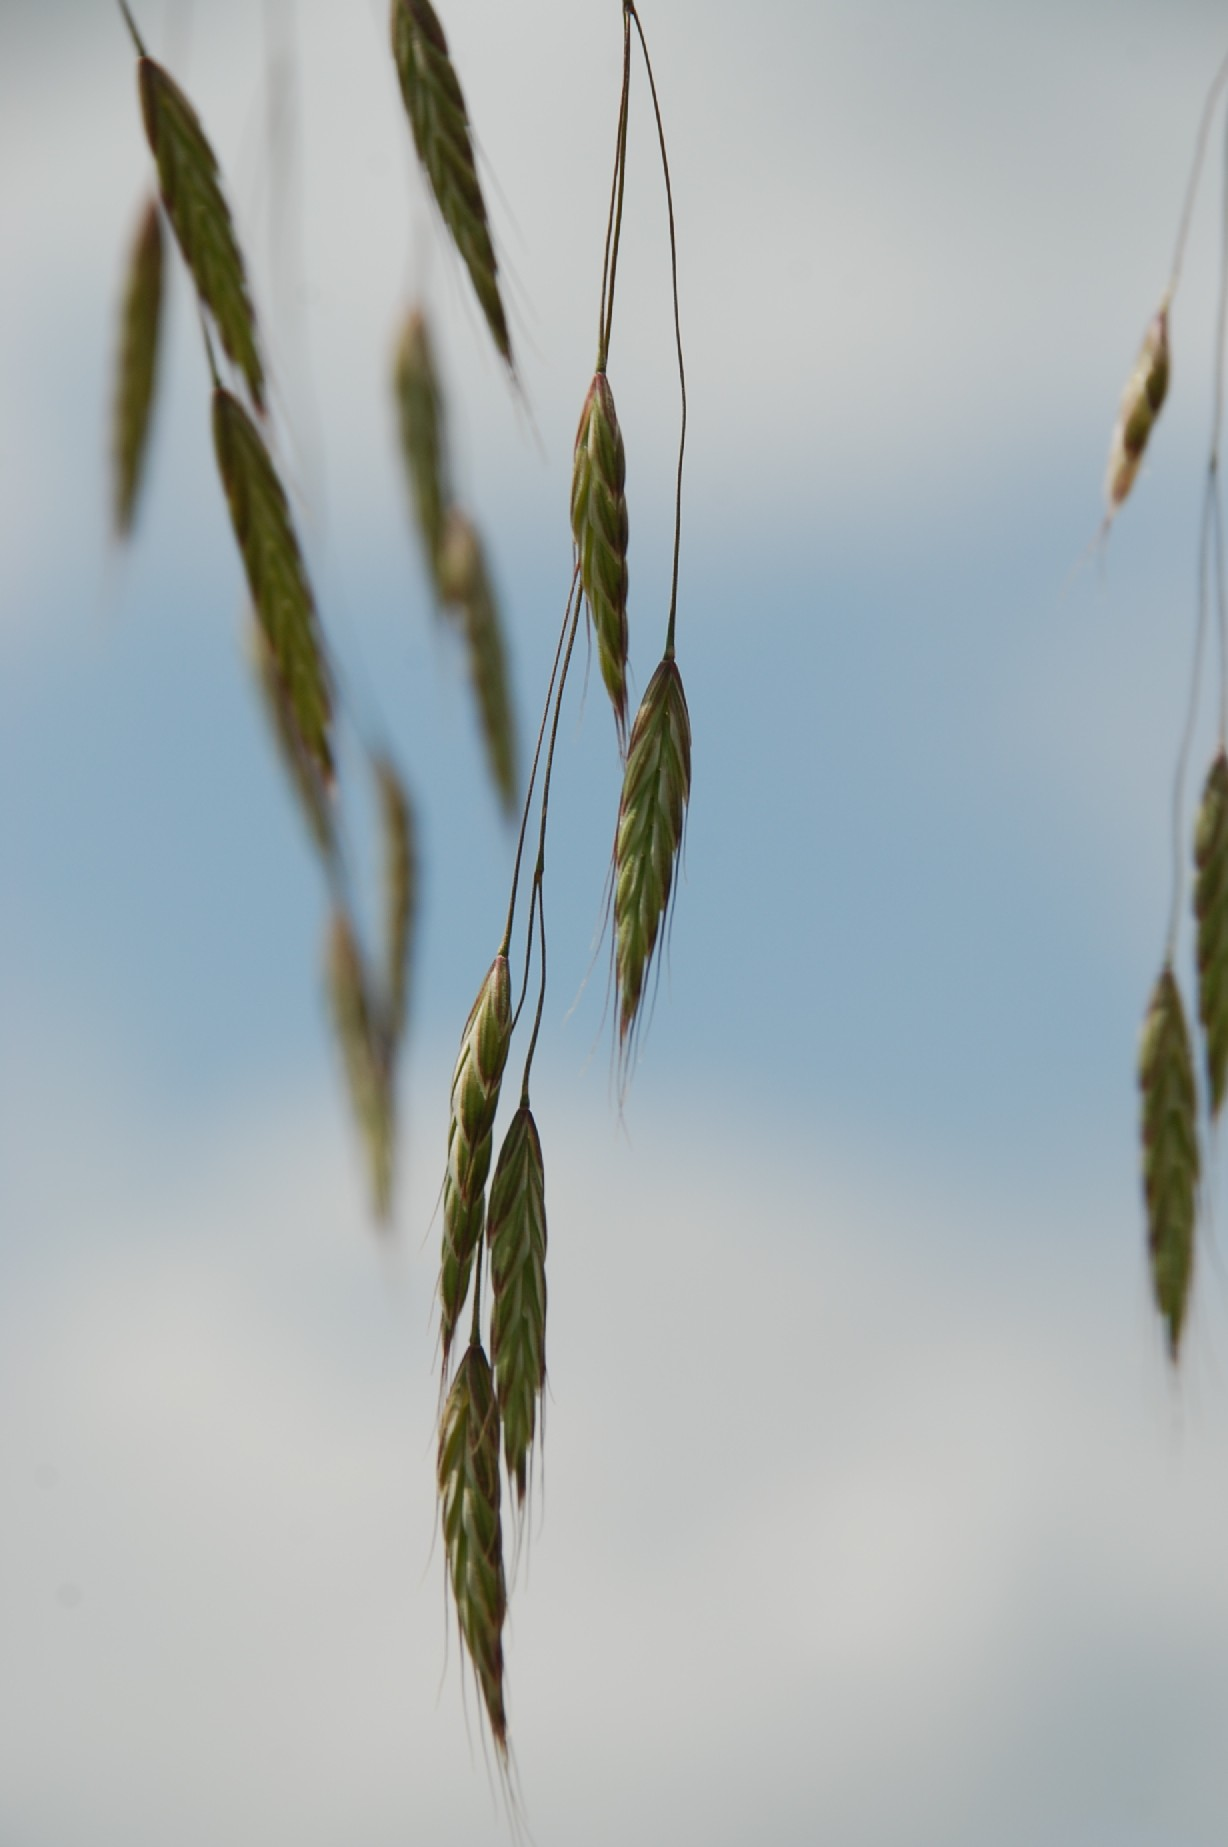 Bromus arvensis subsp. arvensis 3Bromus arvensis subsp. arvensis 3